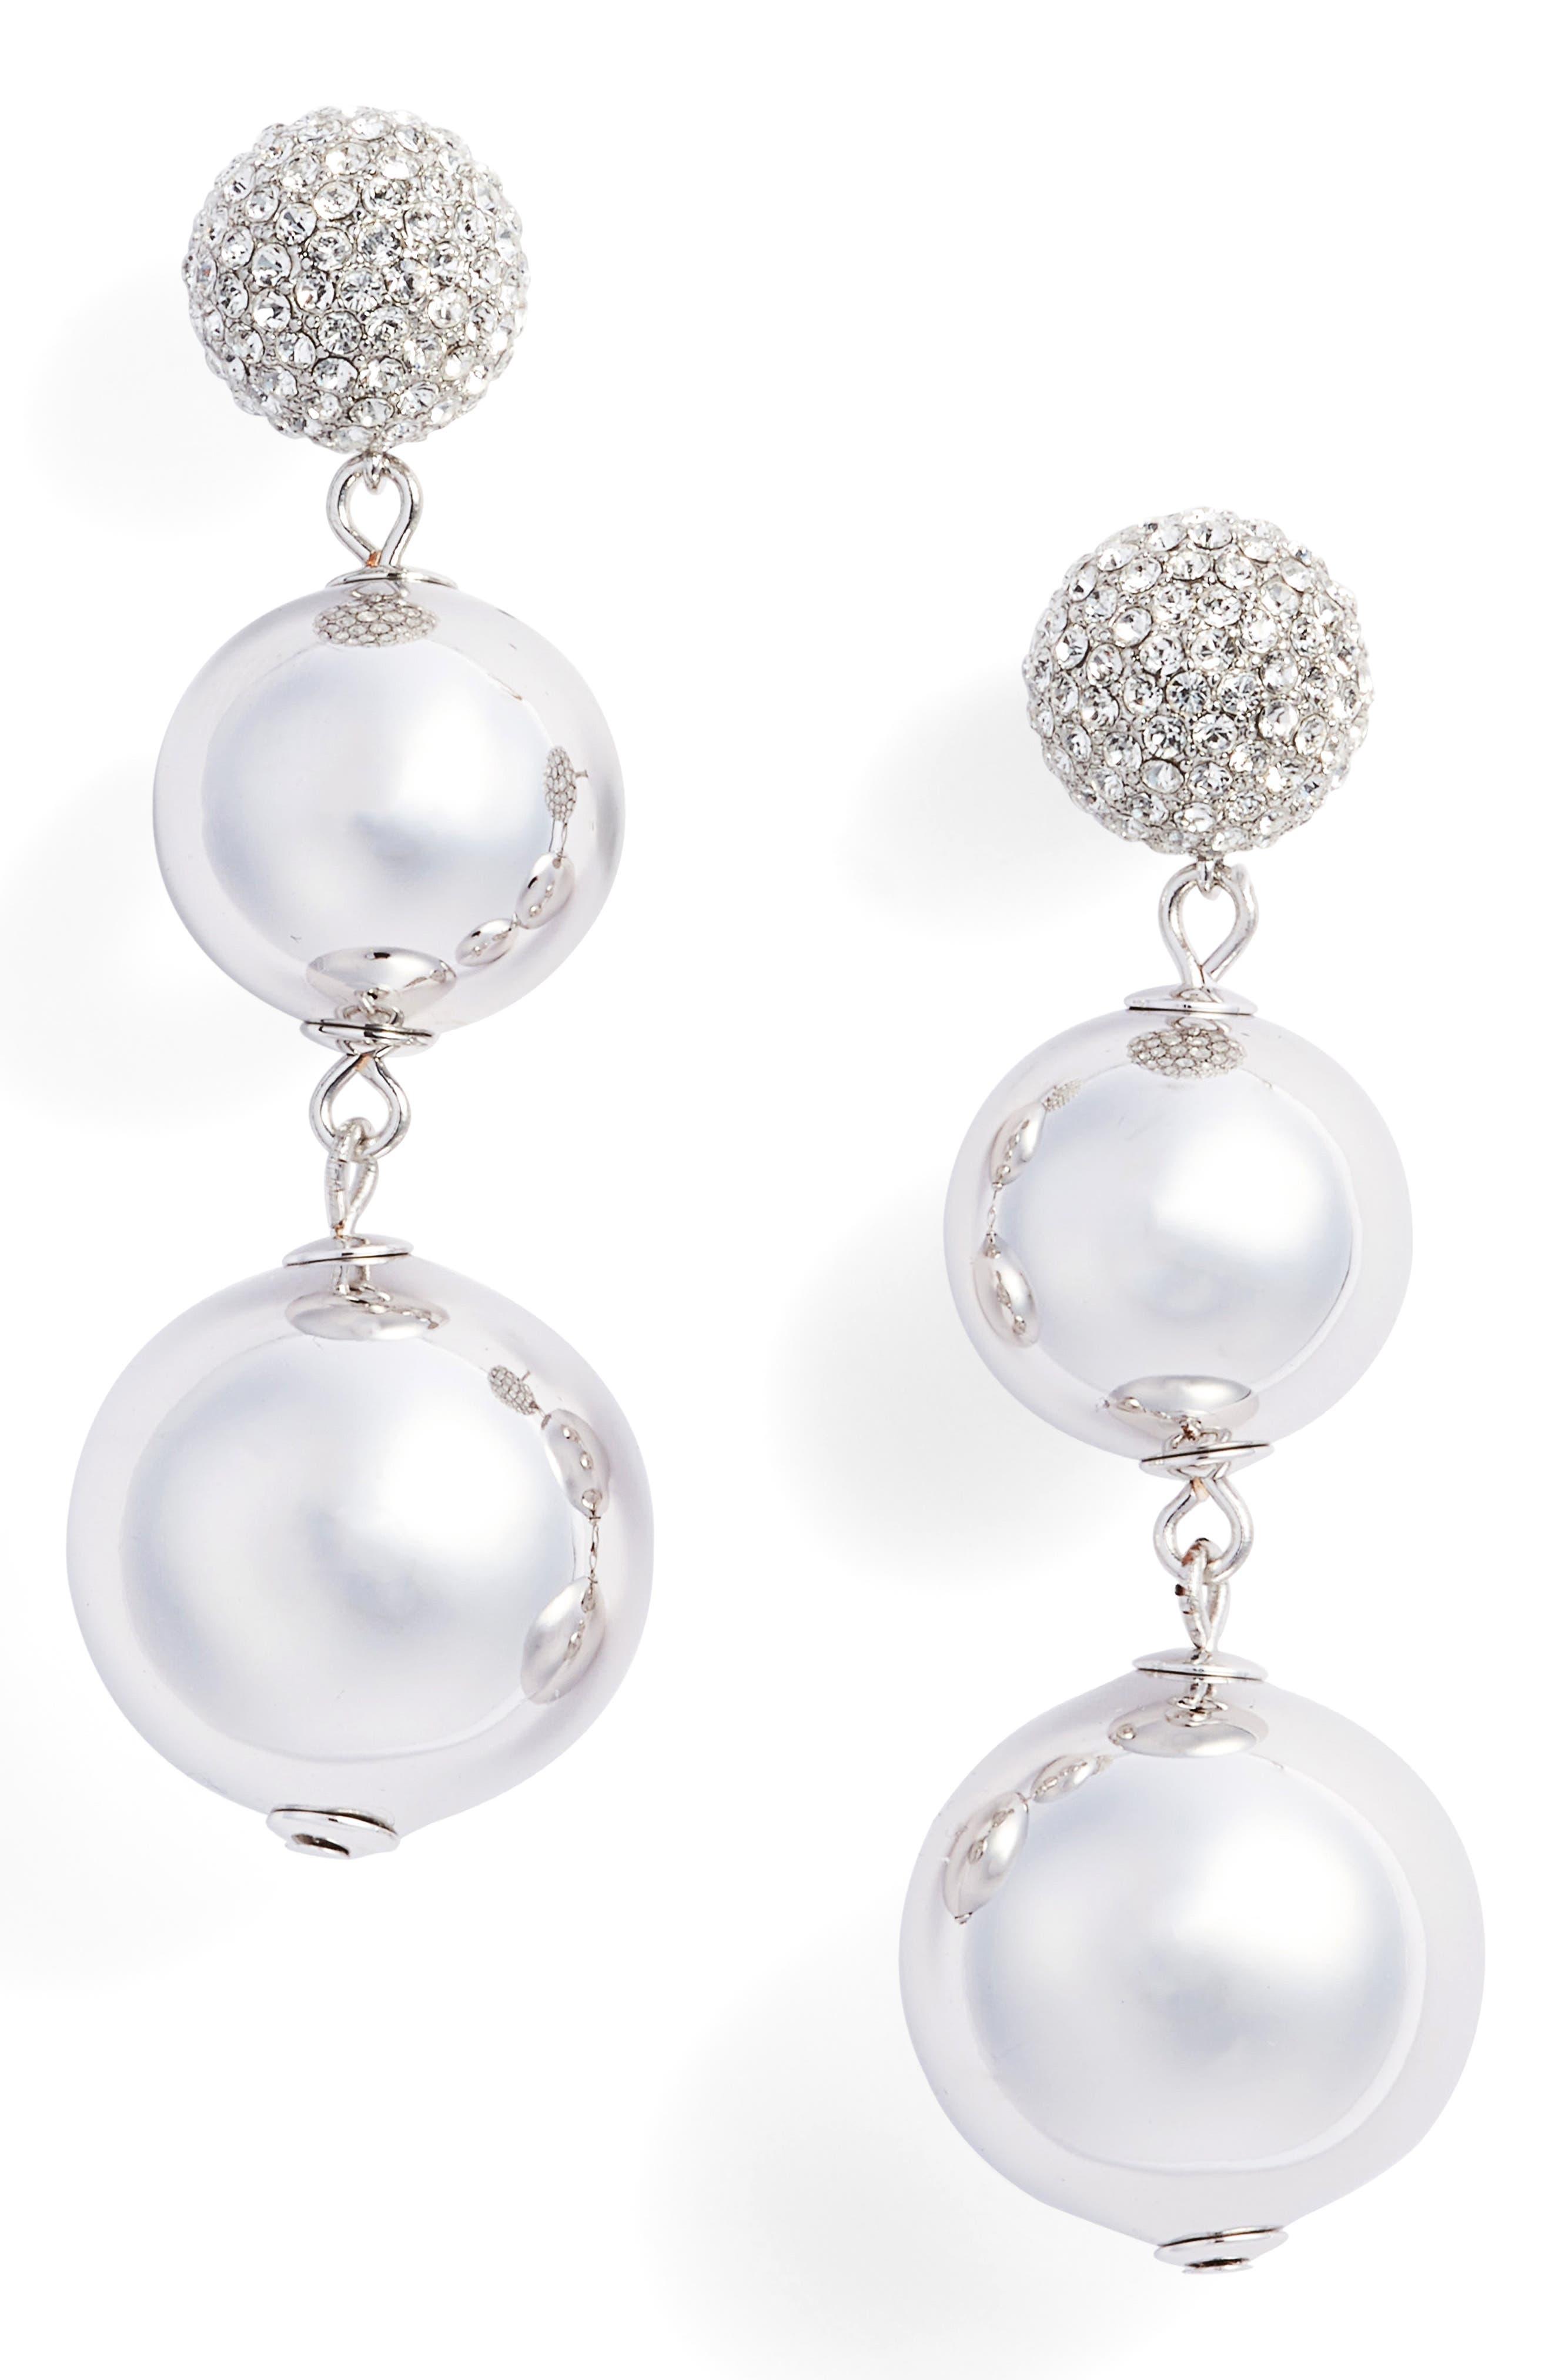 flying colors pavé bauble drop earrings,                             Main thumbnail 1, color,                             Silver